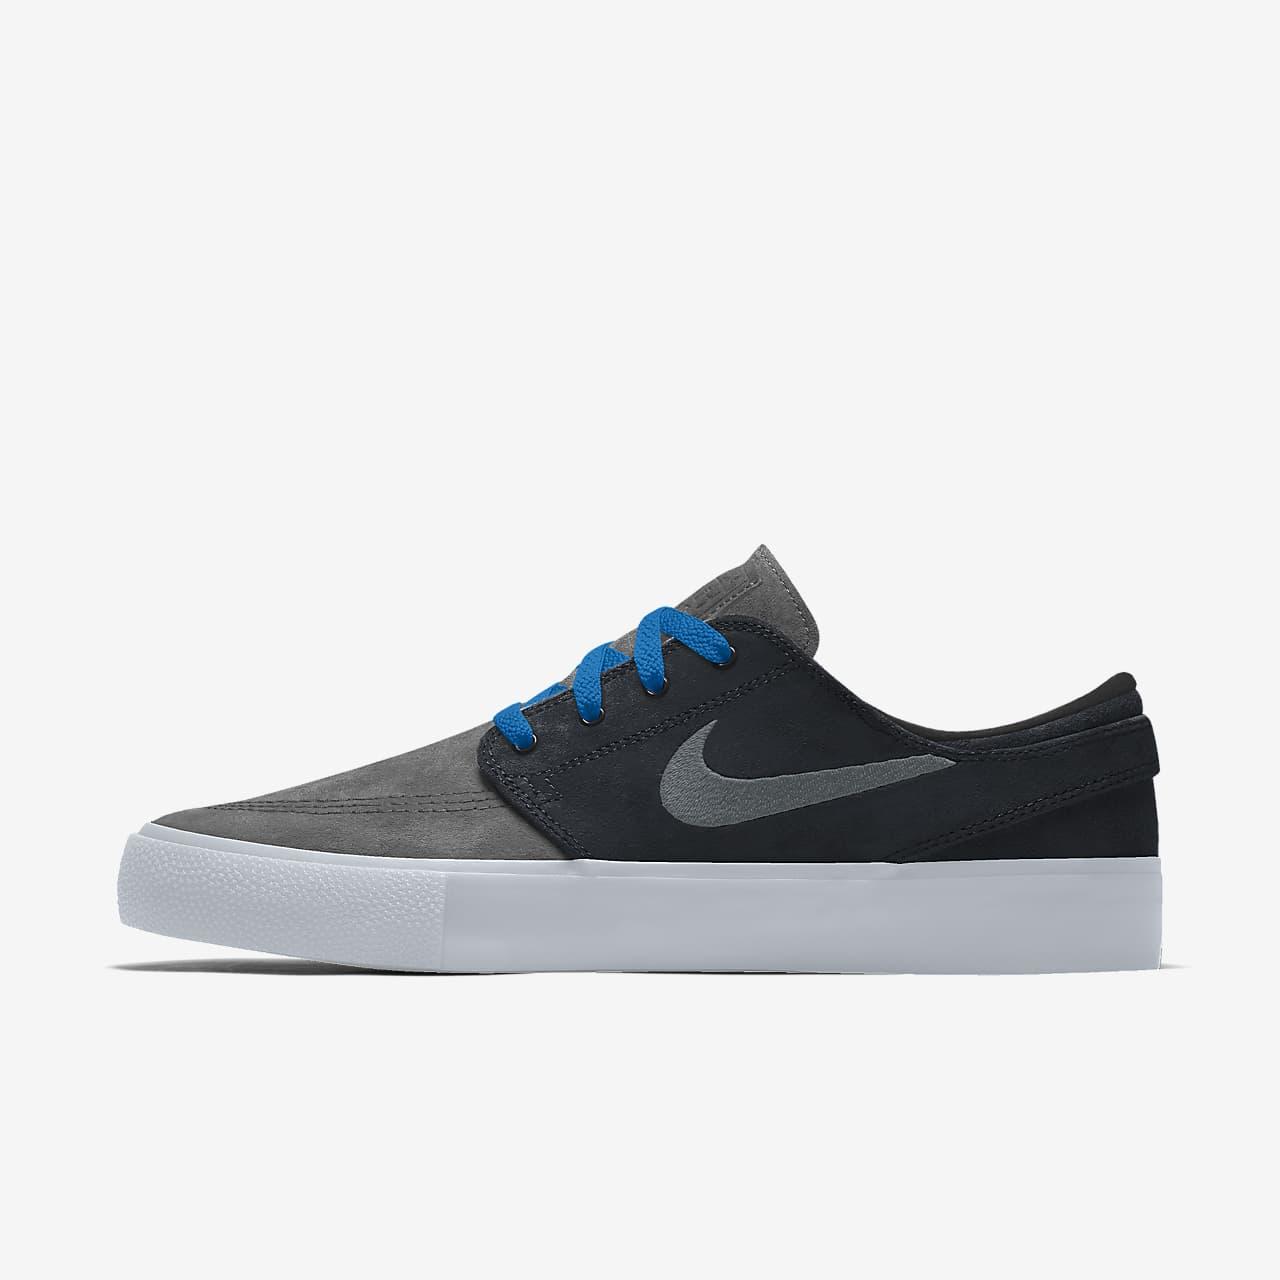 Nike SB Air Zoom Janoski RM By You 专属定制滑板鞋